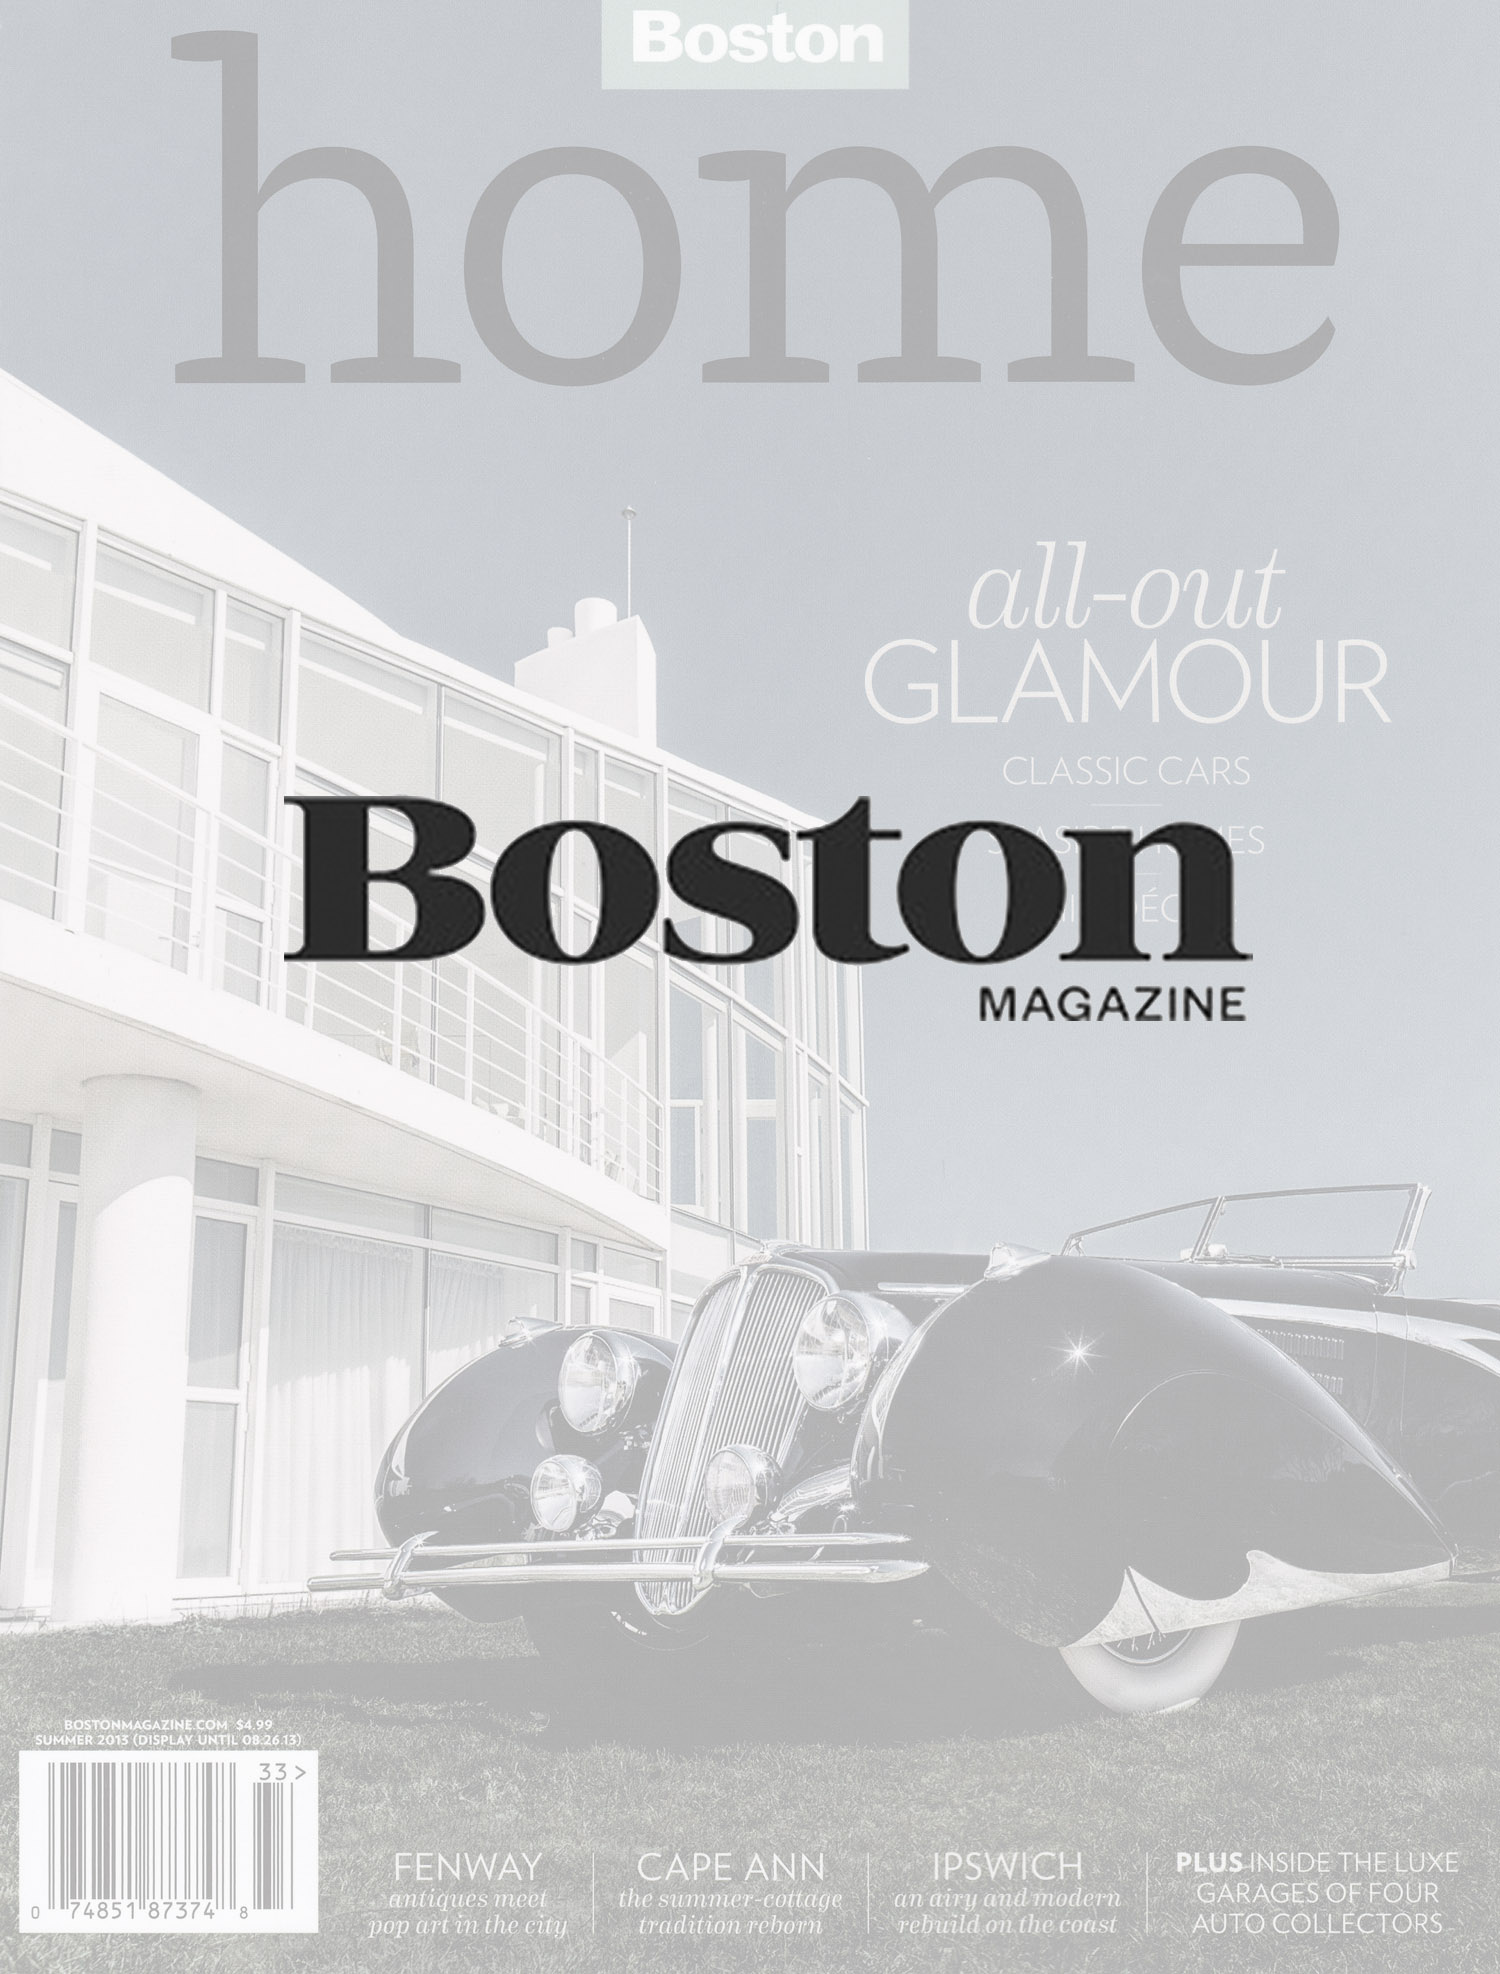 boston magazine cover.jpg